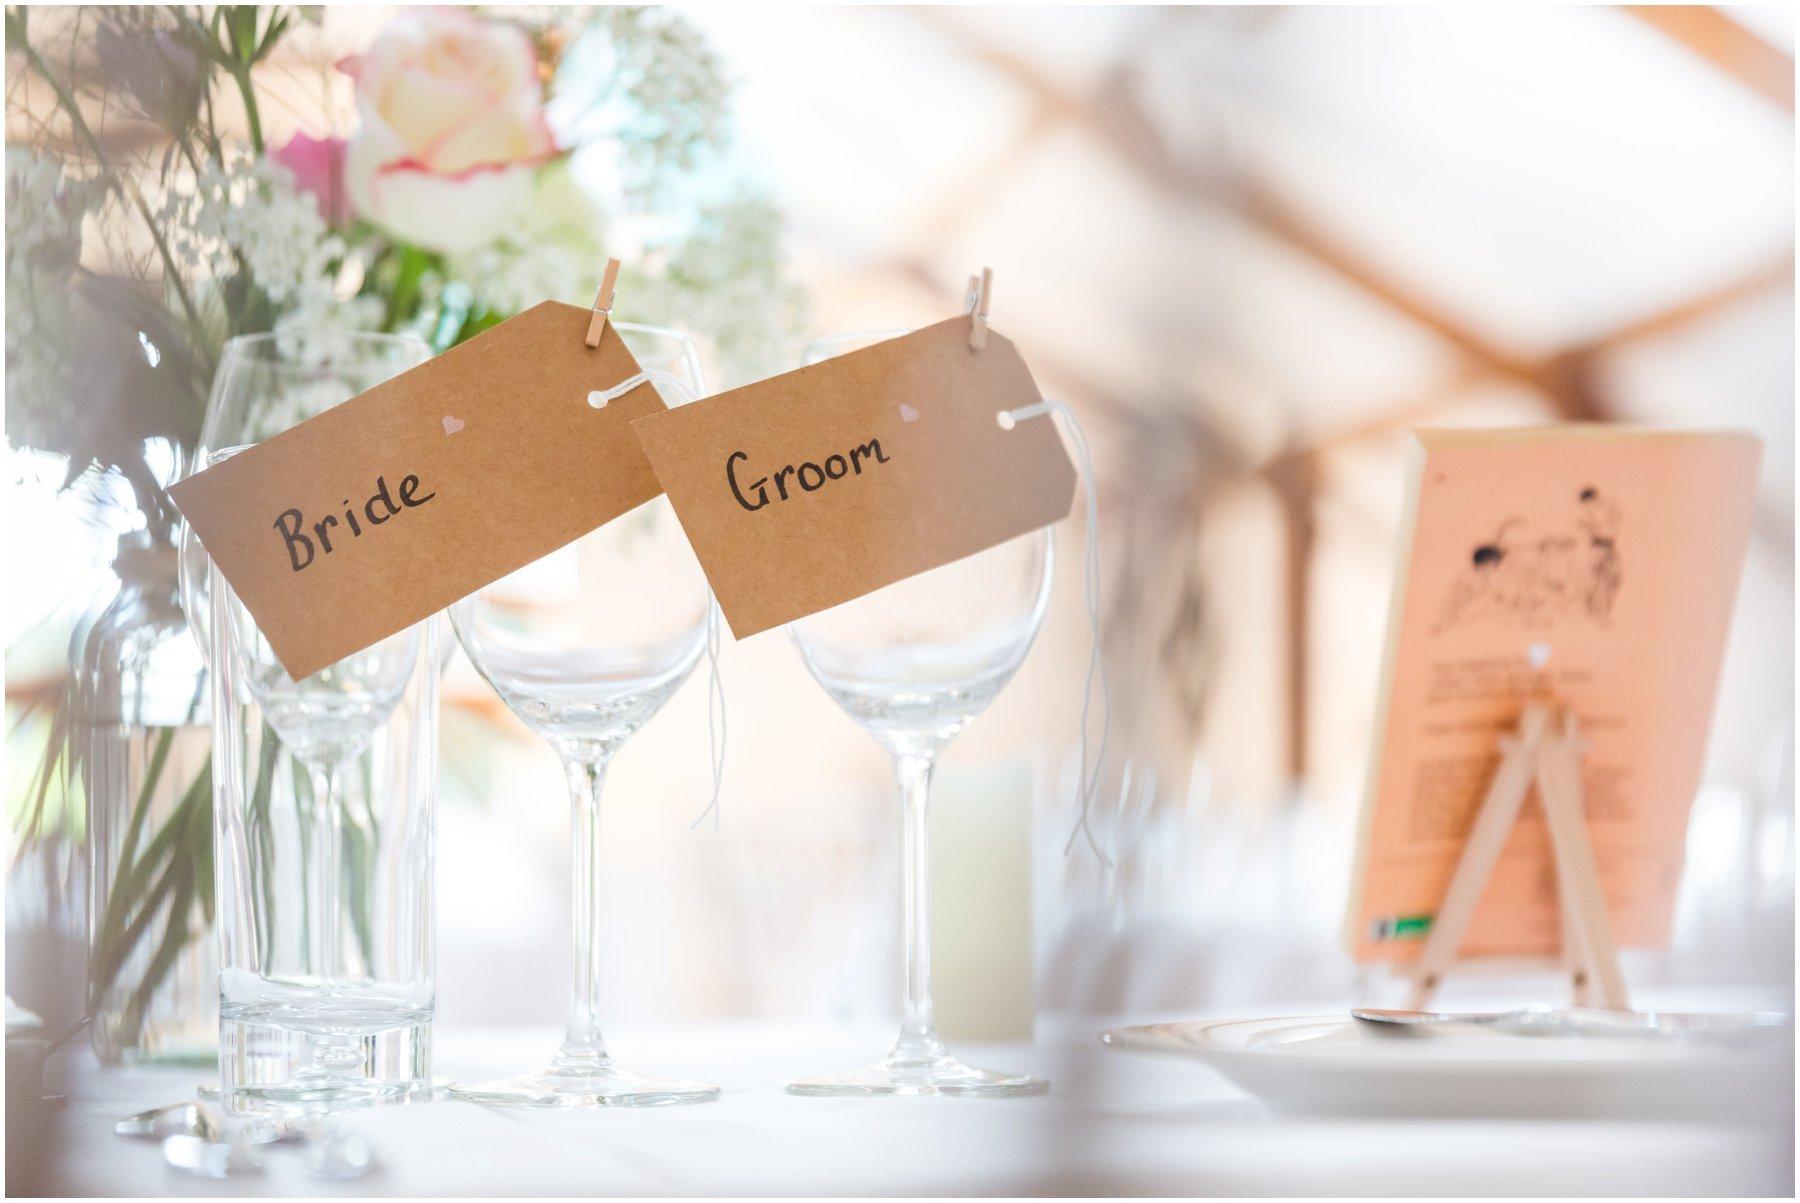 OXNEAD HALL HINDU WEDDING - SOPHIE AND UTSAV - NORFOLK WEDDING PHOTOGRAPHER 2